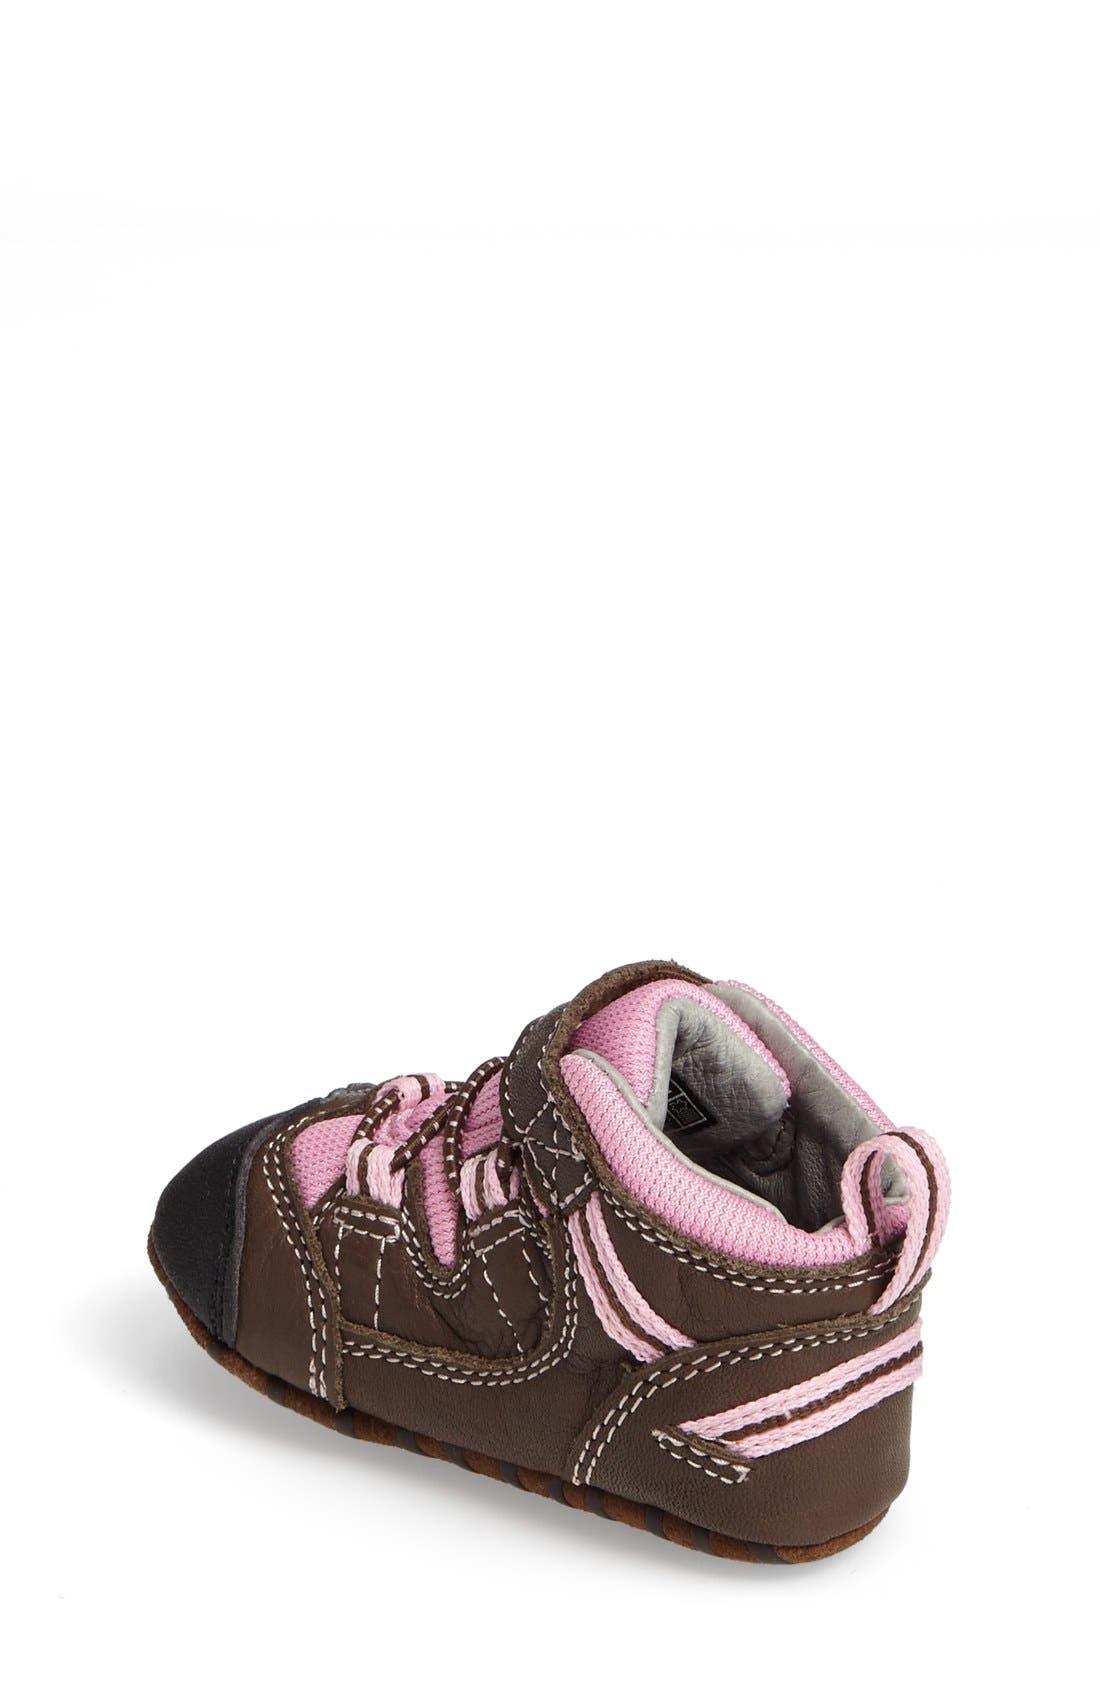 Targhee Crib Shoe,                             Alternate thumbnail 7, color,                             204